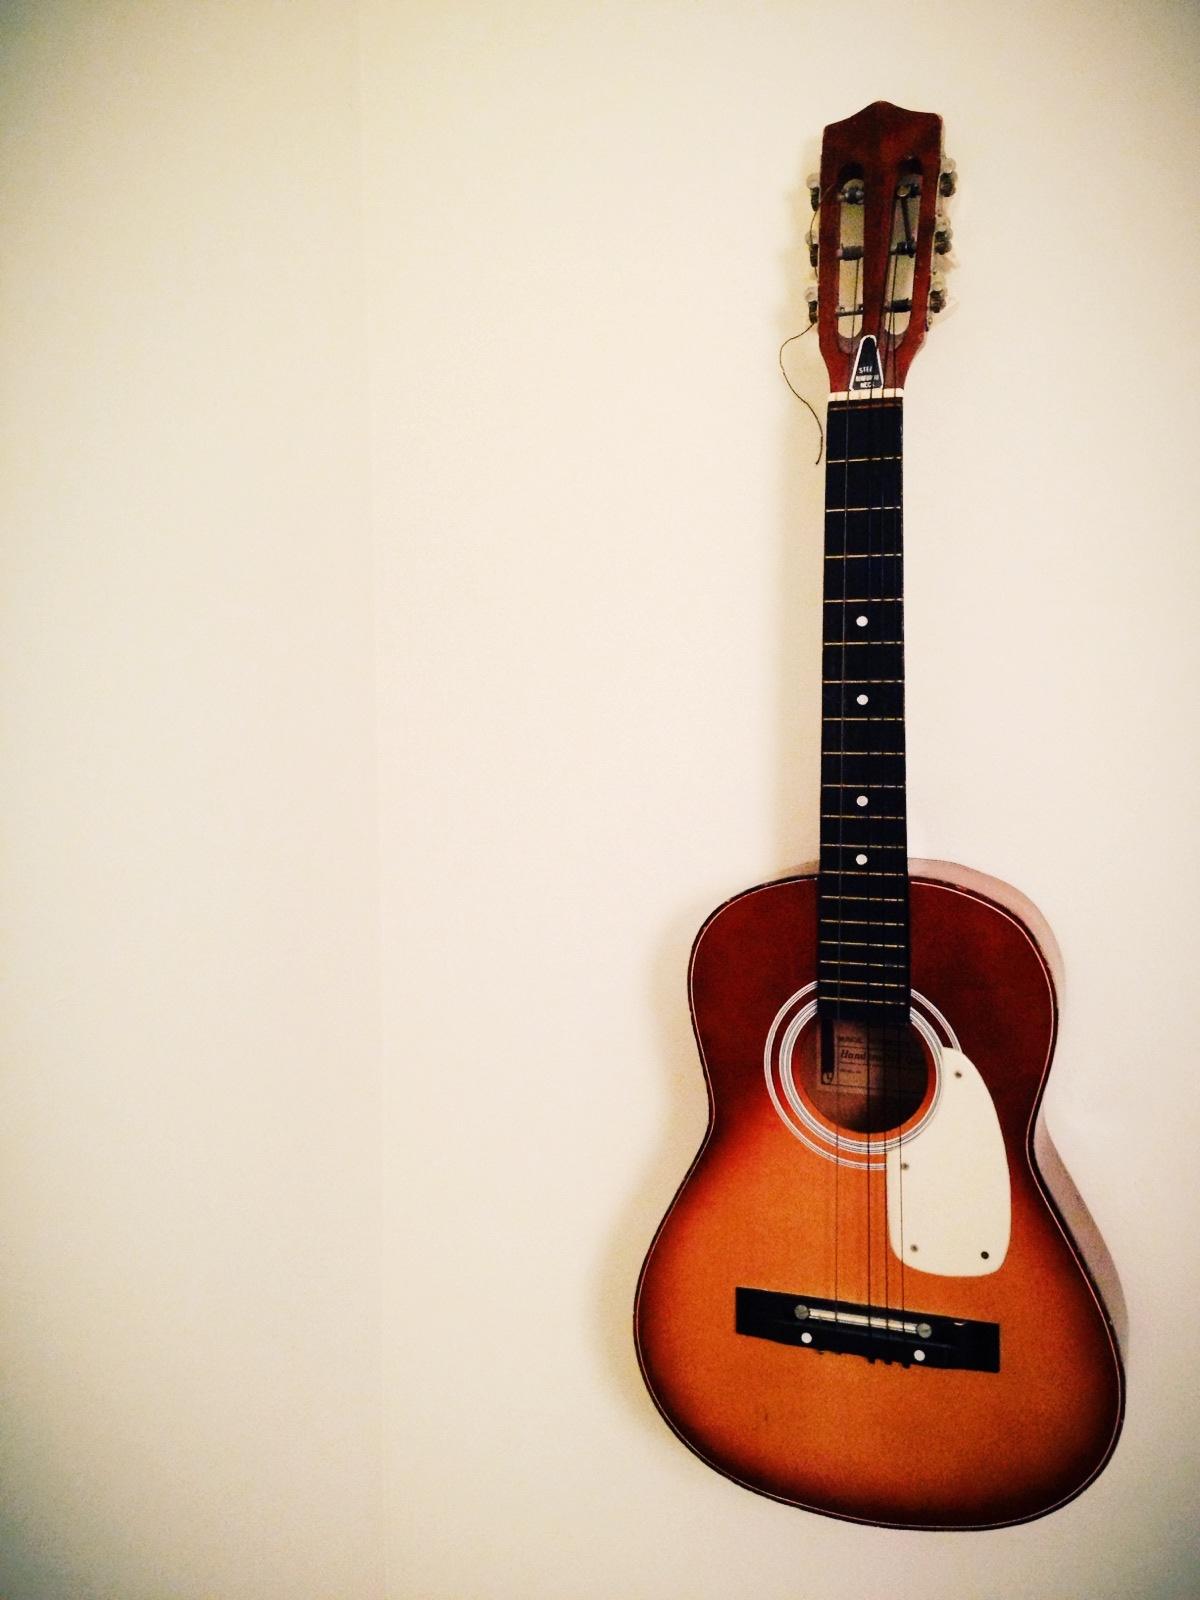 Childhood guitar